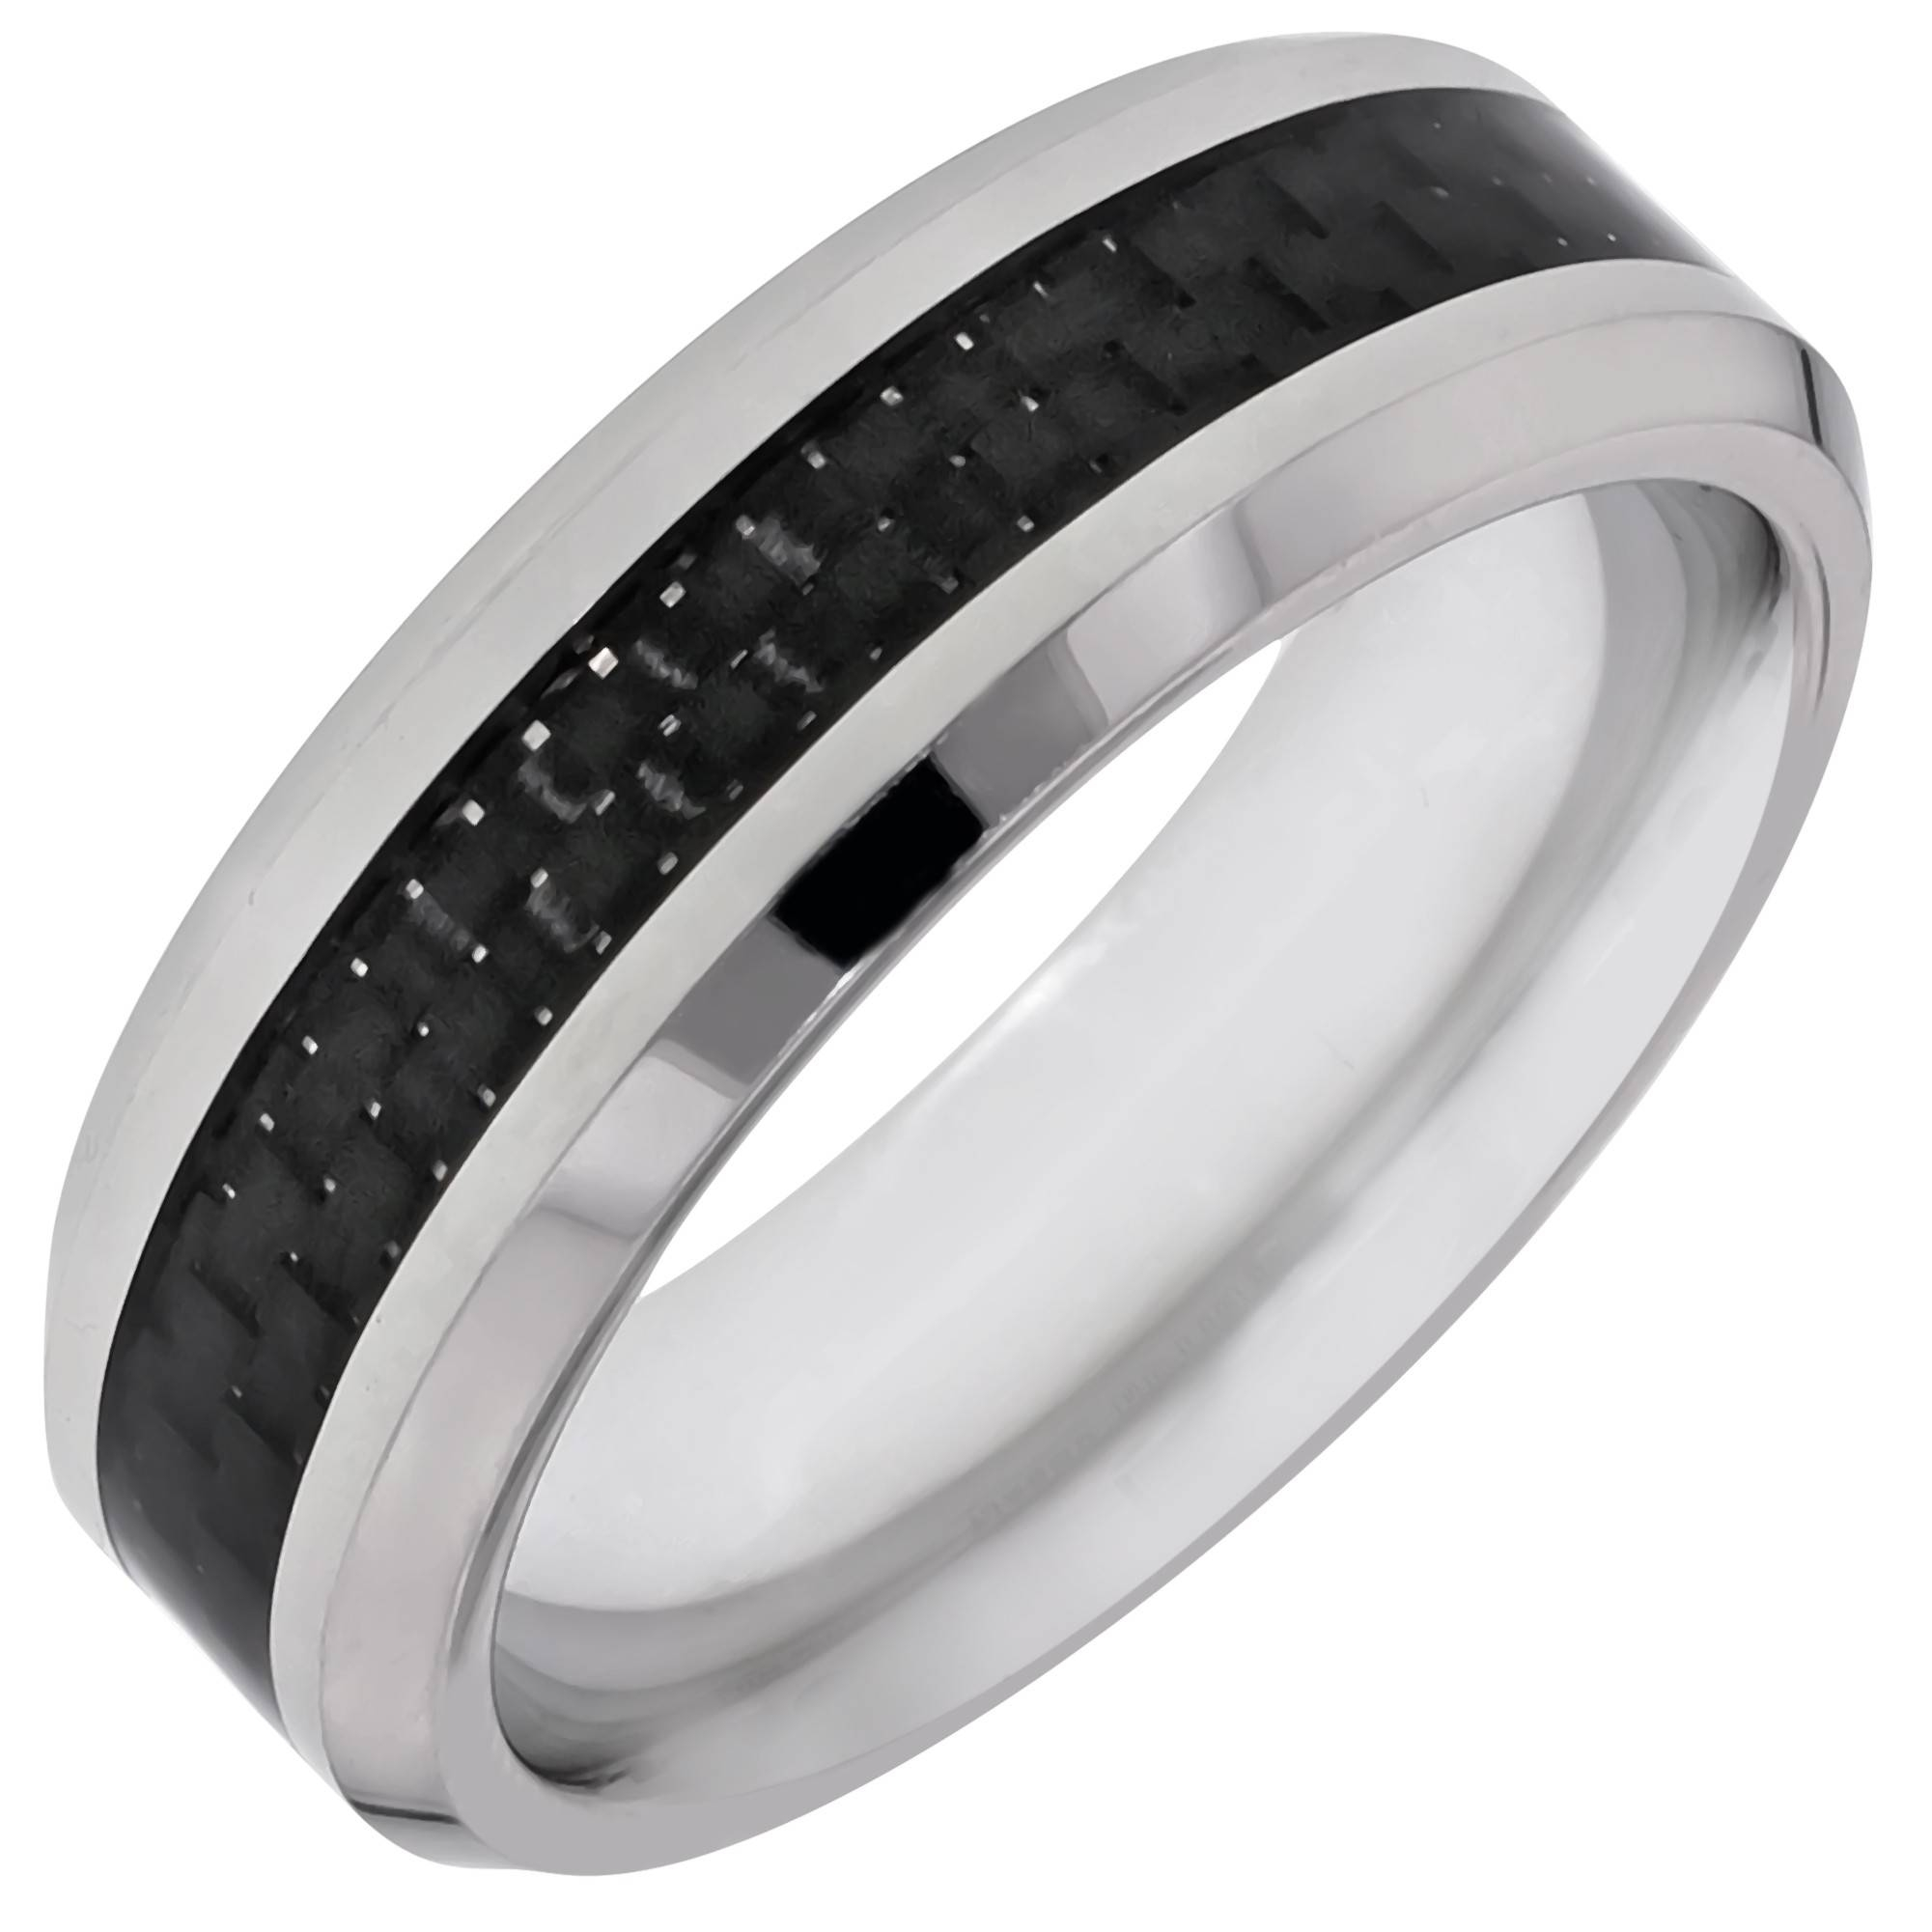 Mens Cobalt Wedding Rings 031 - Mens Cobalt Wedding Rings